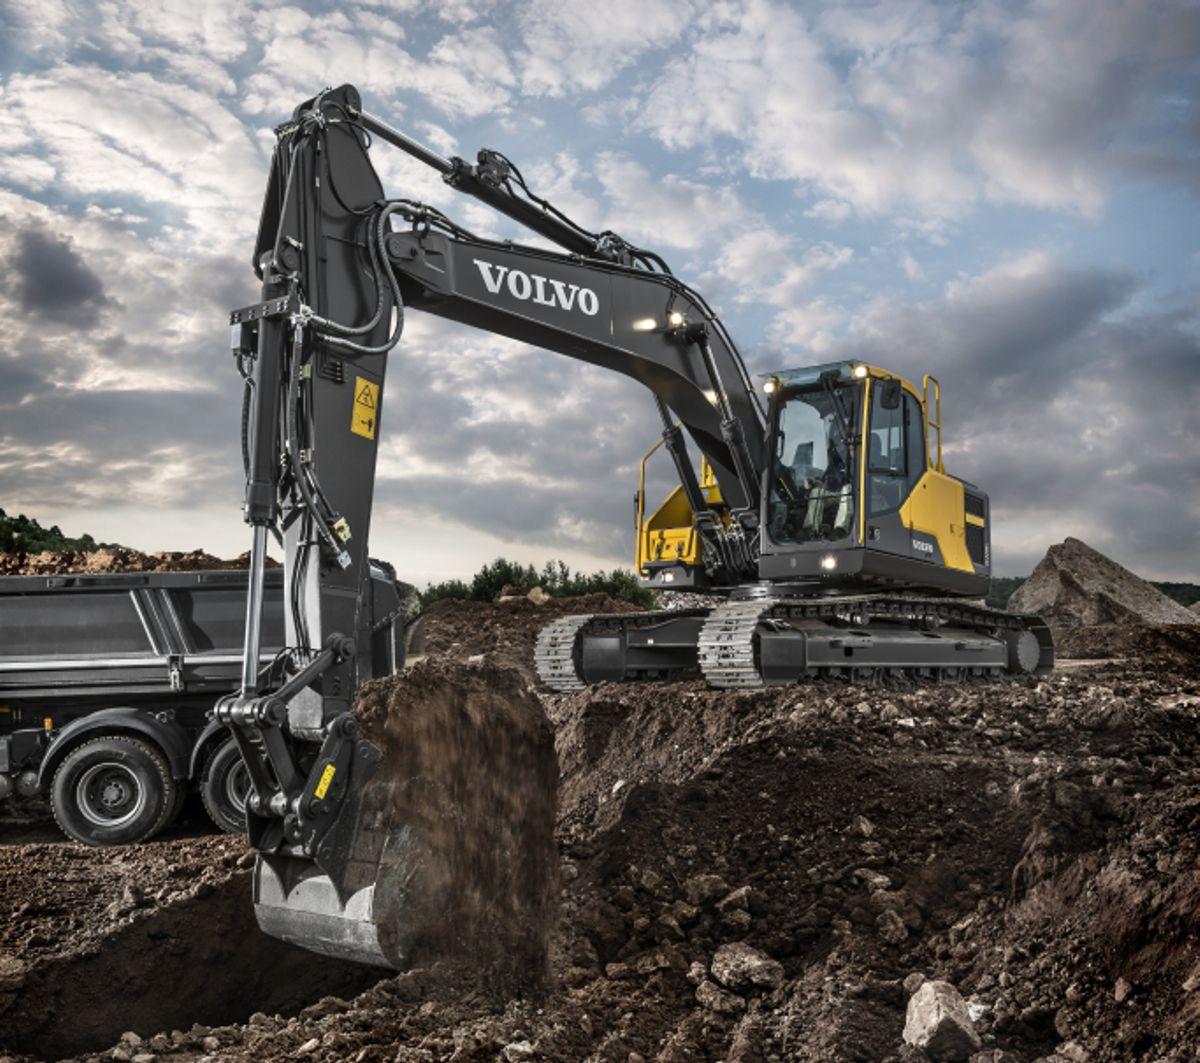 Euro IV compliant Construction Machines featured at bauma China